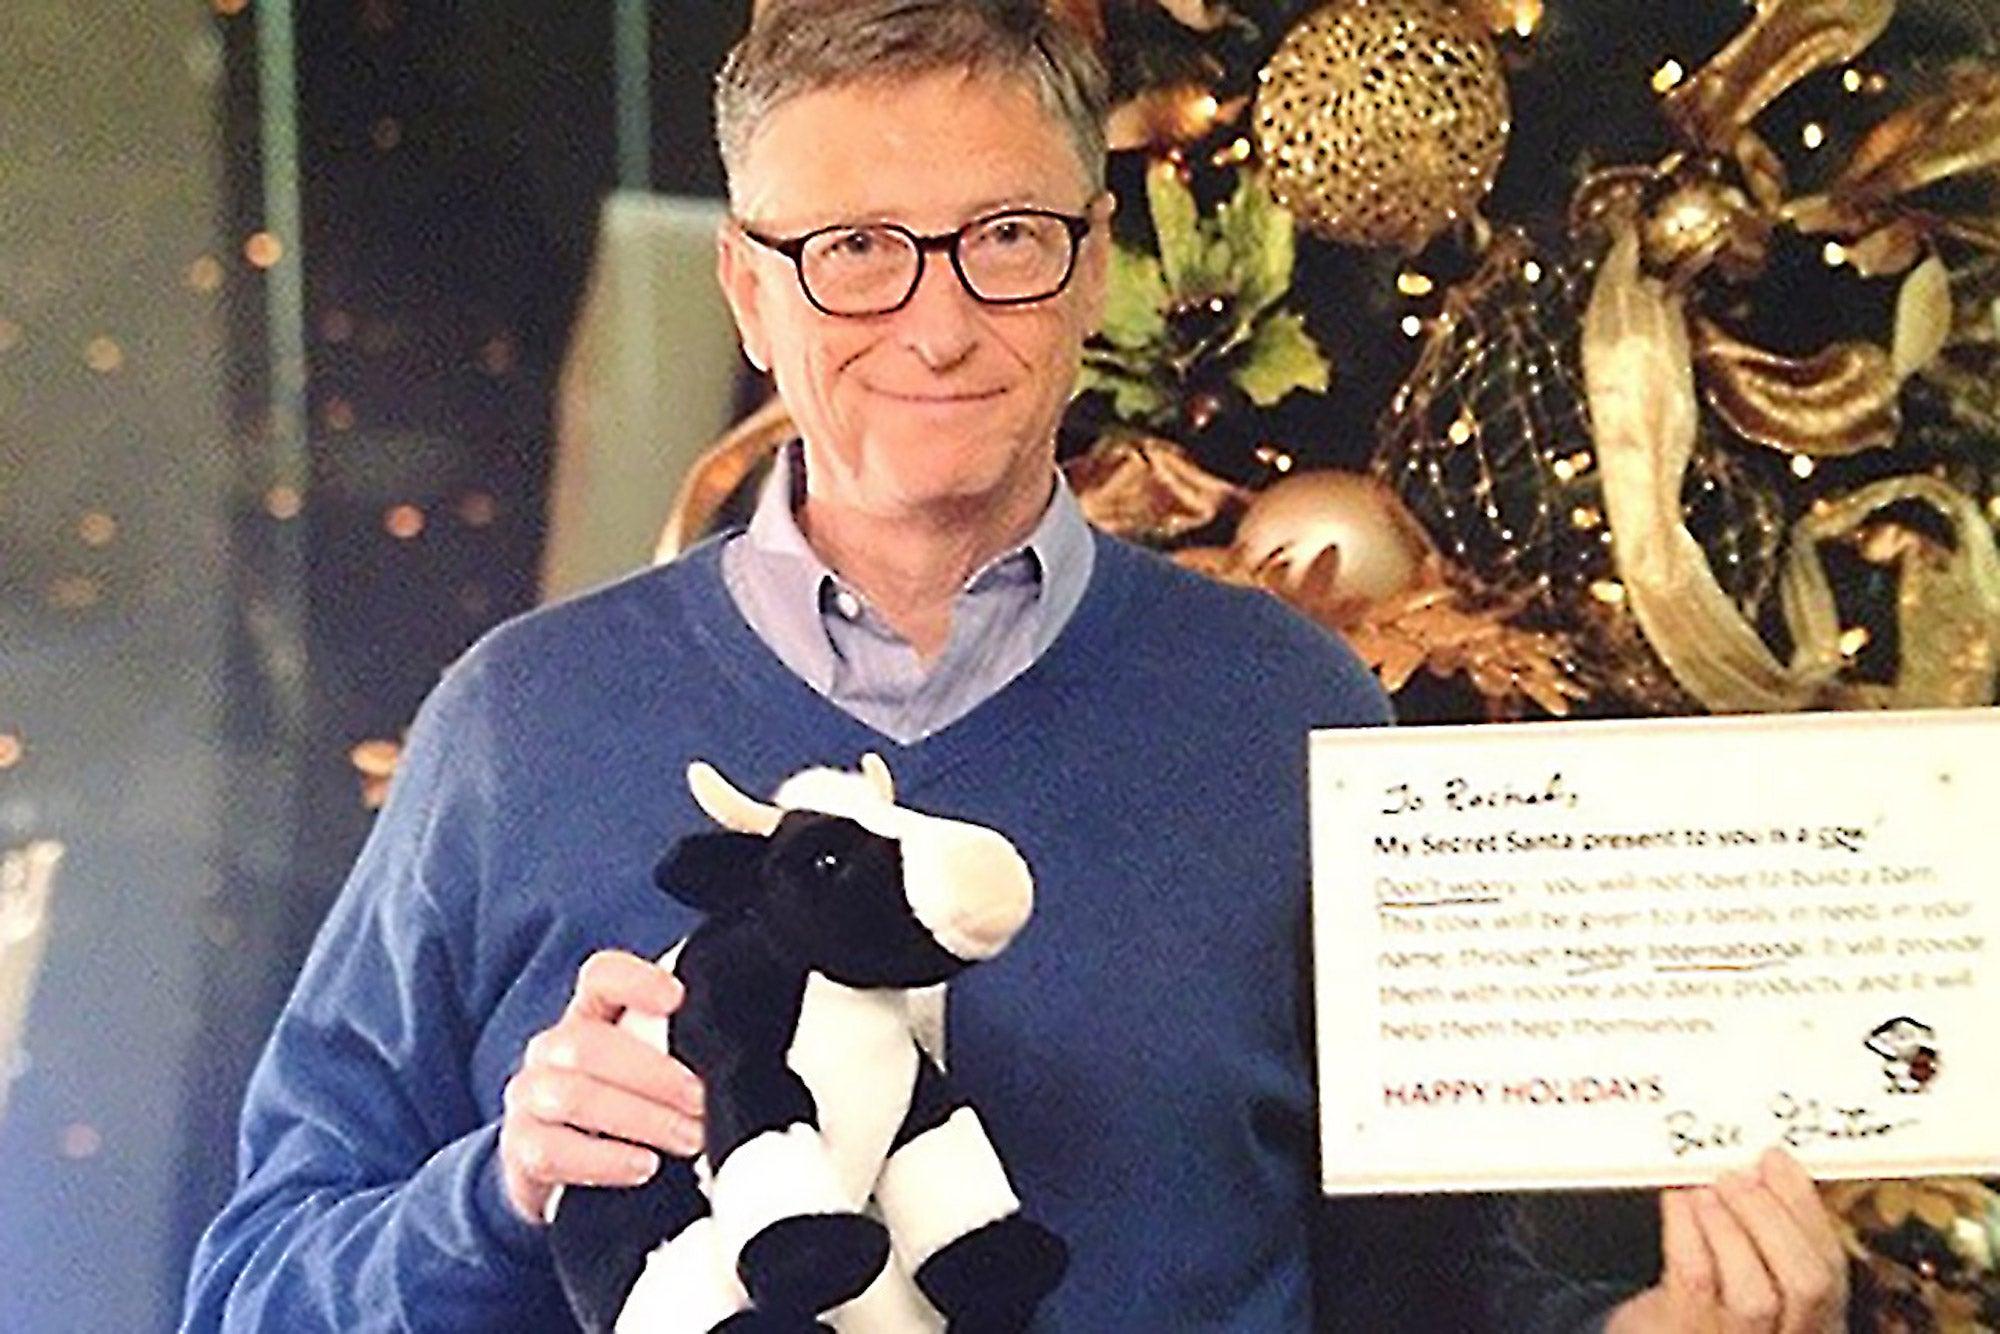 Holy Cow Bill Gates Plays Secret Santa In Reddit Christmas Miracle